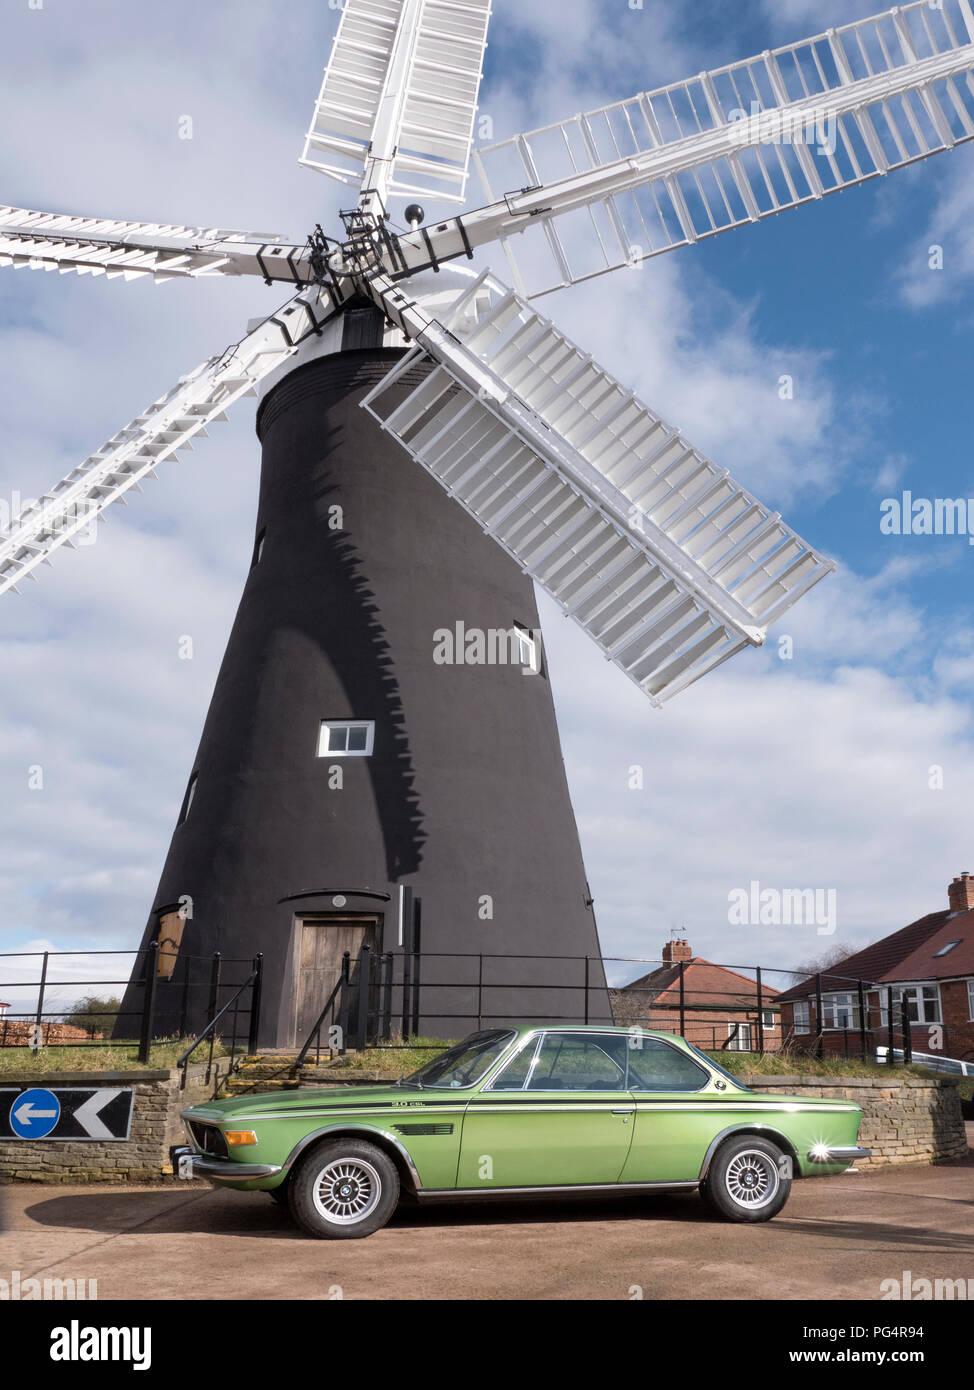 1972 BMW 3.0 CSL Holgate Windmill York UK - Stock Image